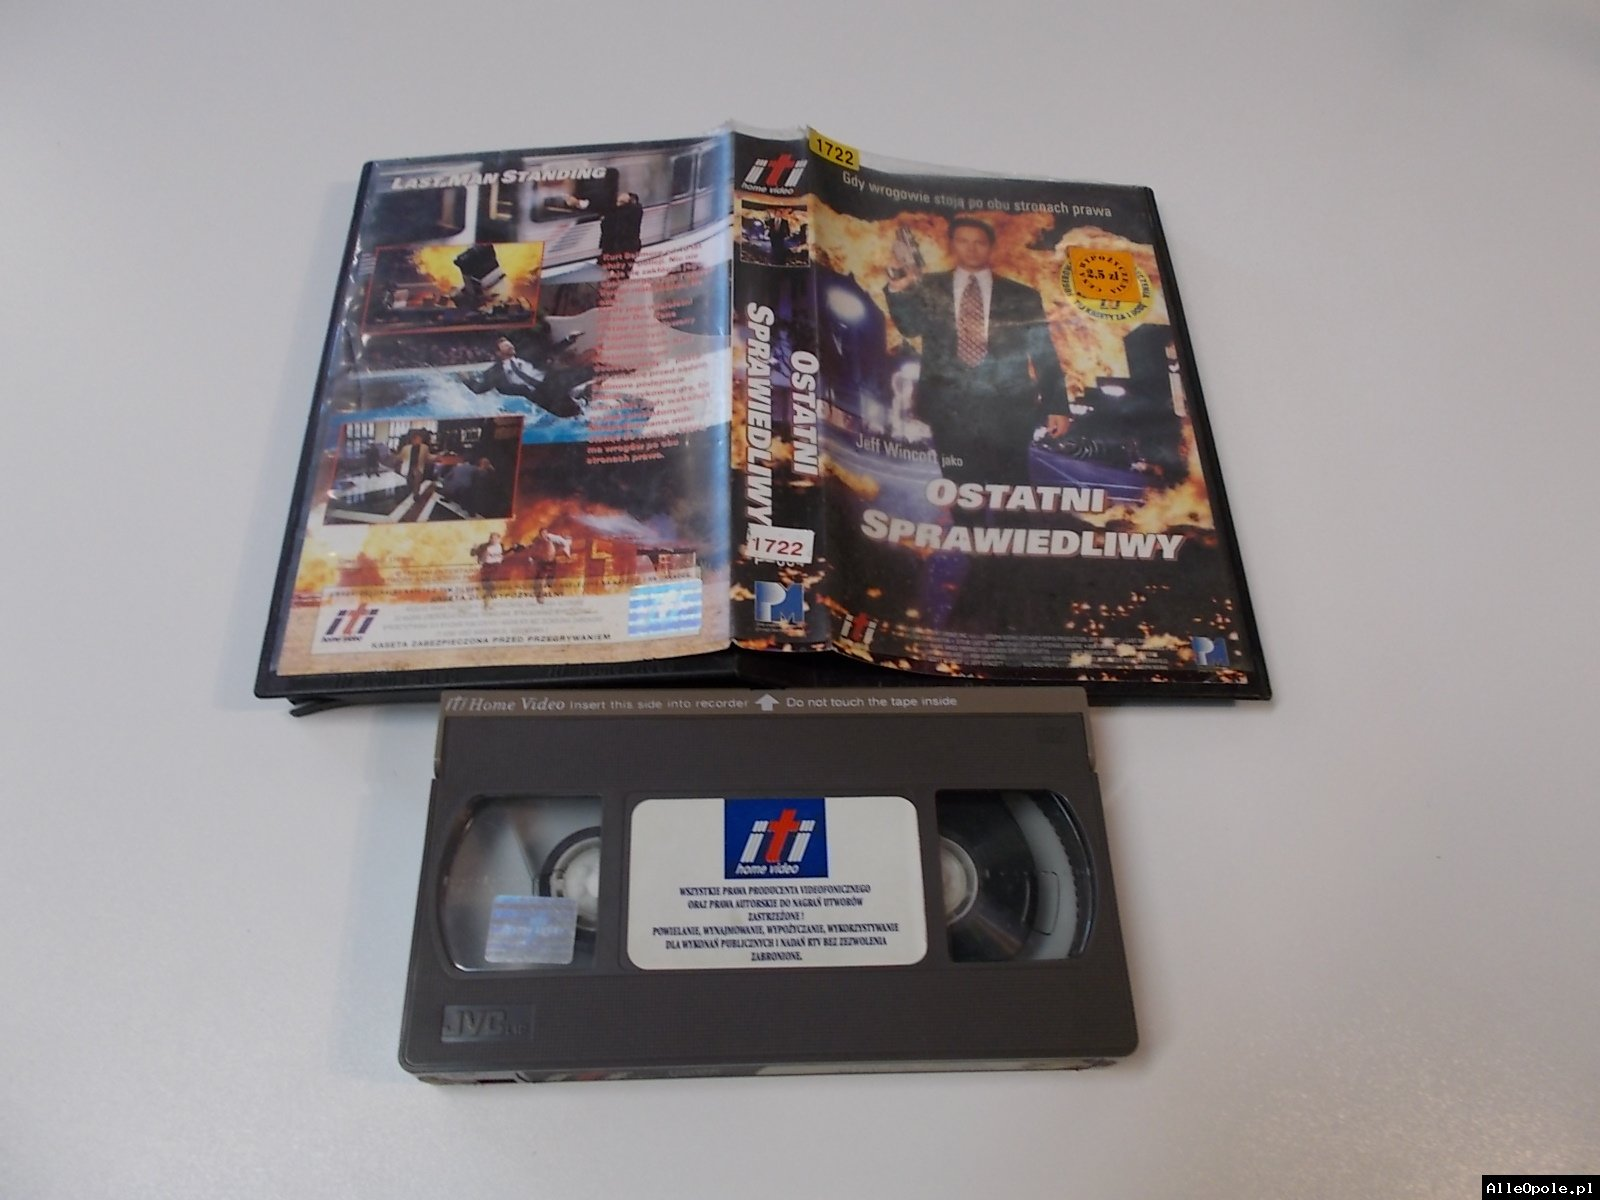 OSTATNI SPRAWIEDLIWY - VHS Kaseta Video - Opole 1705